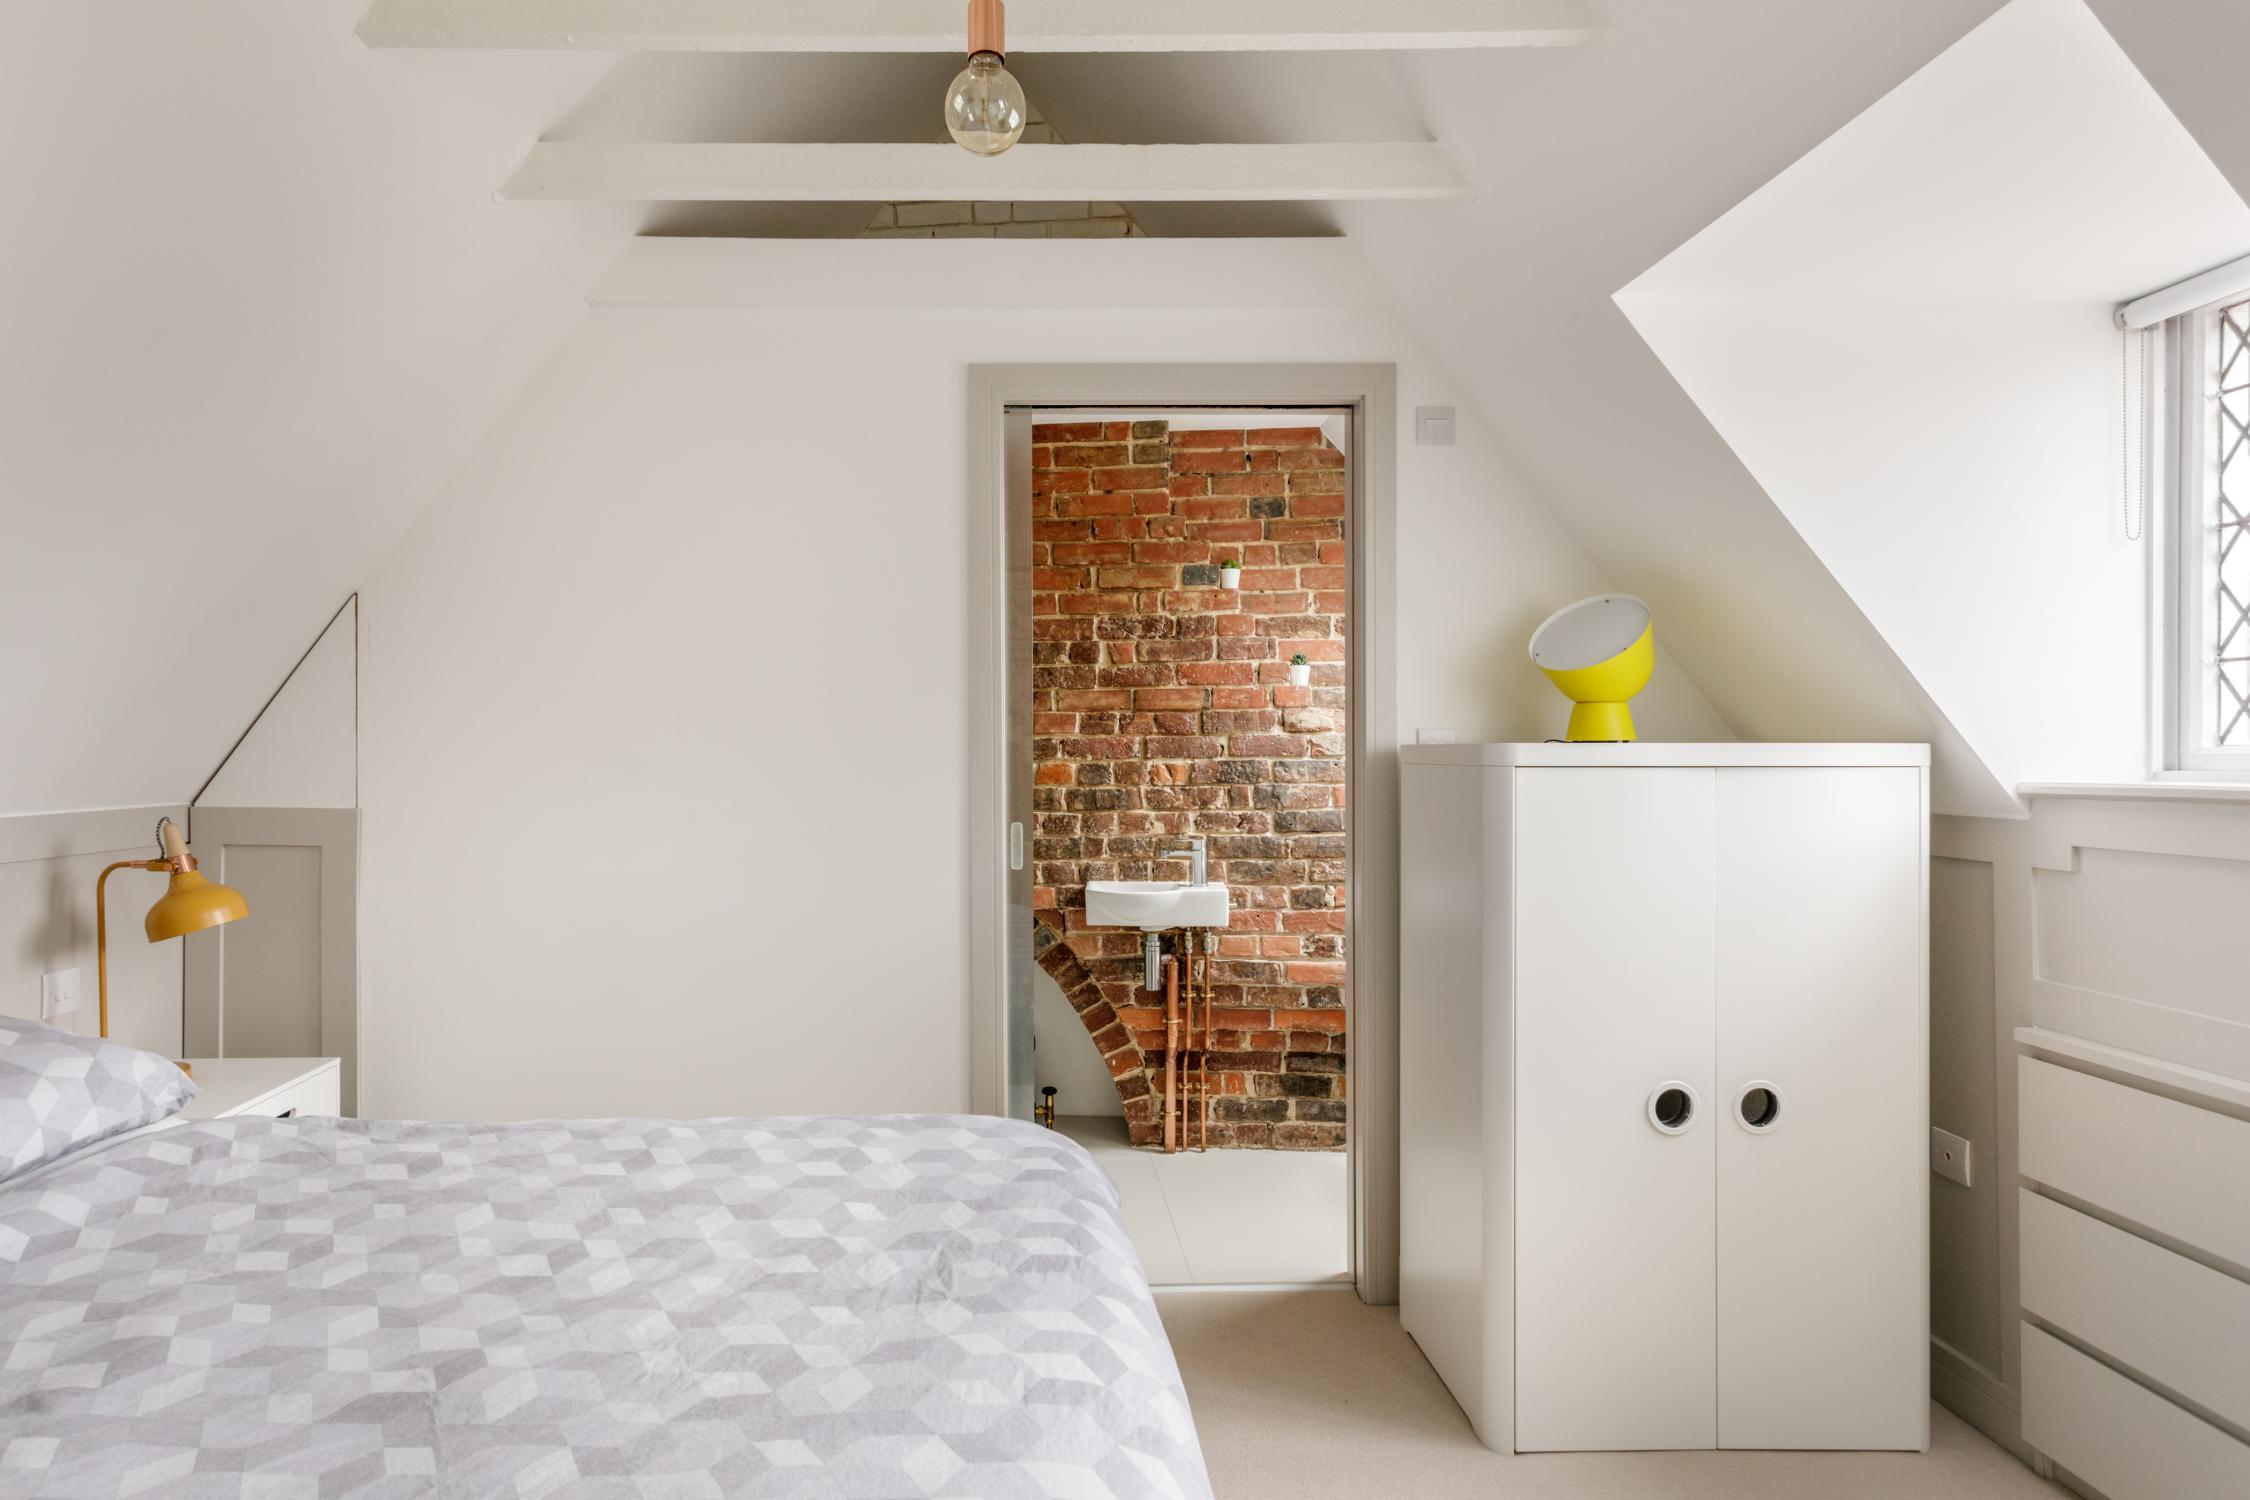 Worthing Builders-ExtraOrdinaryRooms-Arundel renovation Loft Conversion.jpg